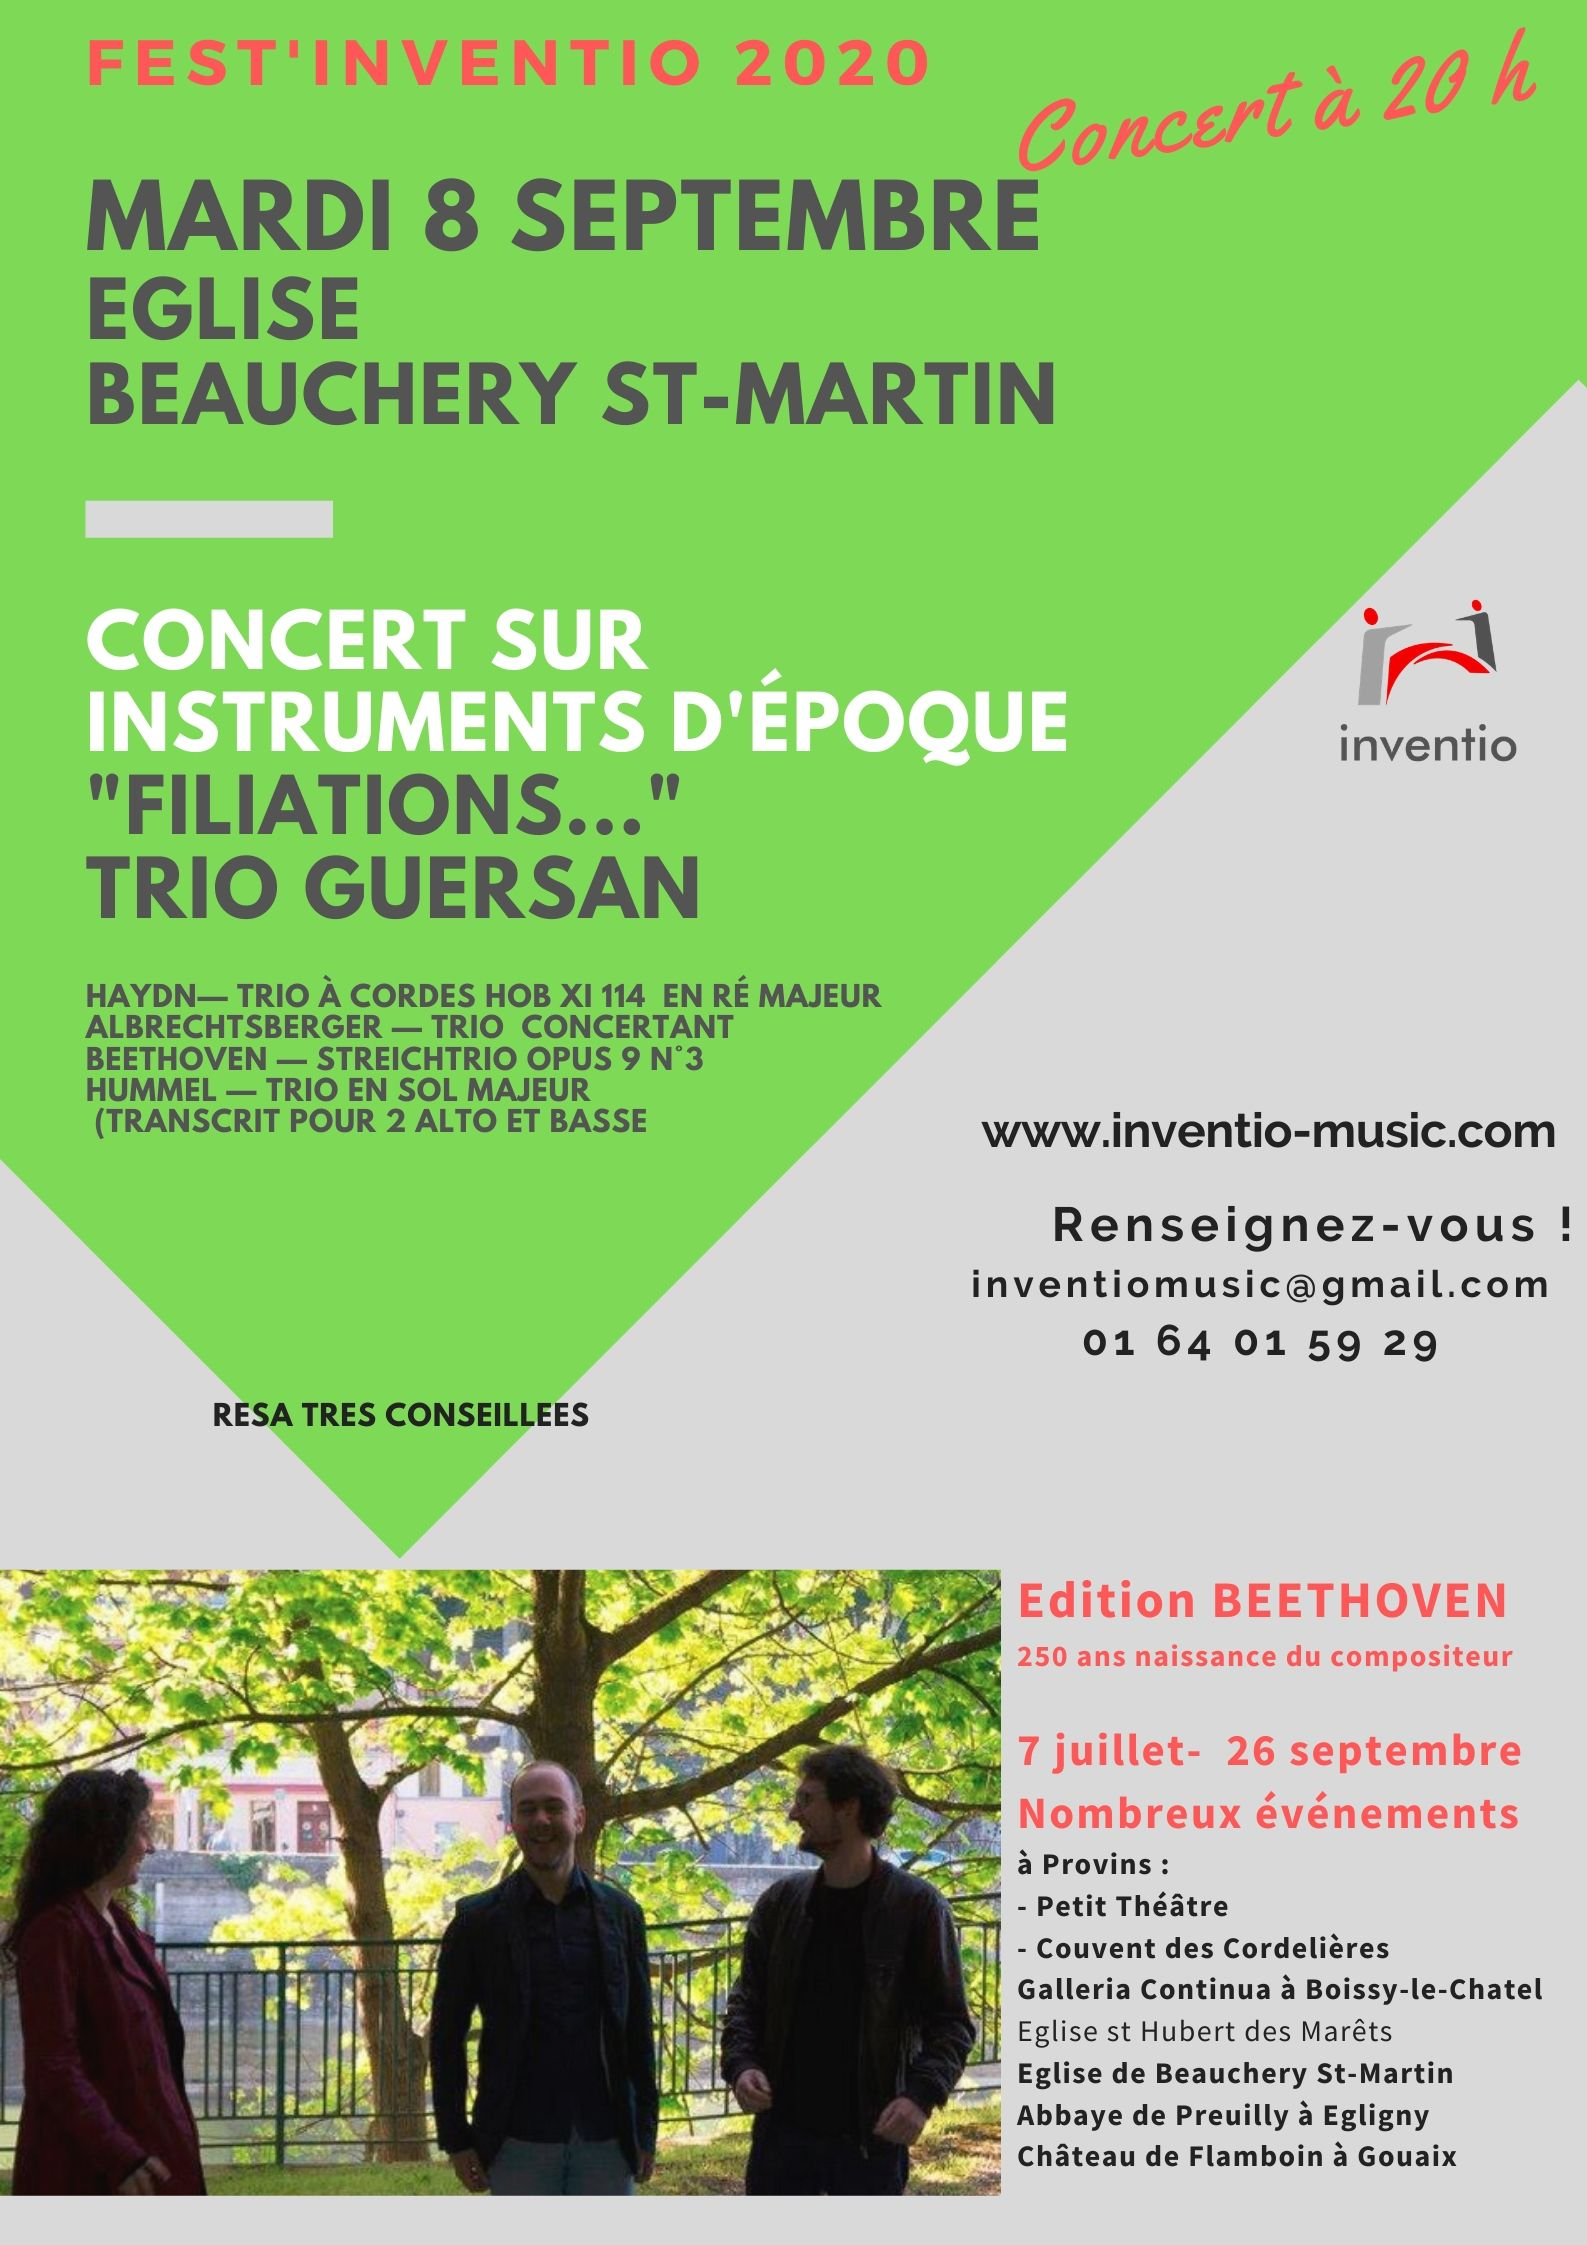 FEST'INVENTION CONCERT BEAUCHERY ST MARTIN @ Eglise de Beauchery St Martin